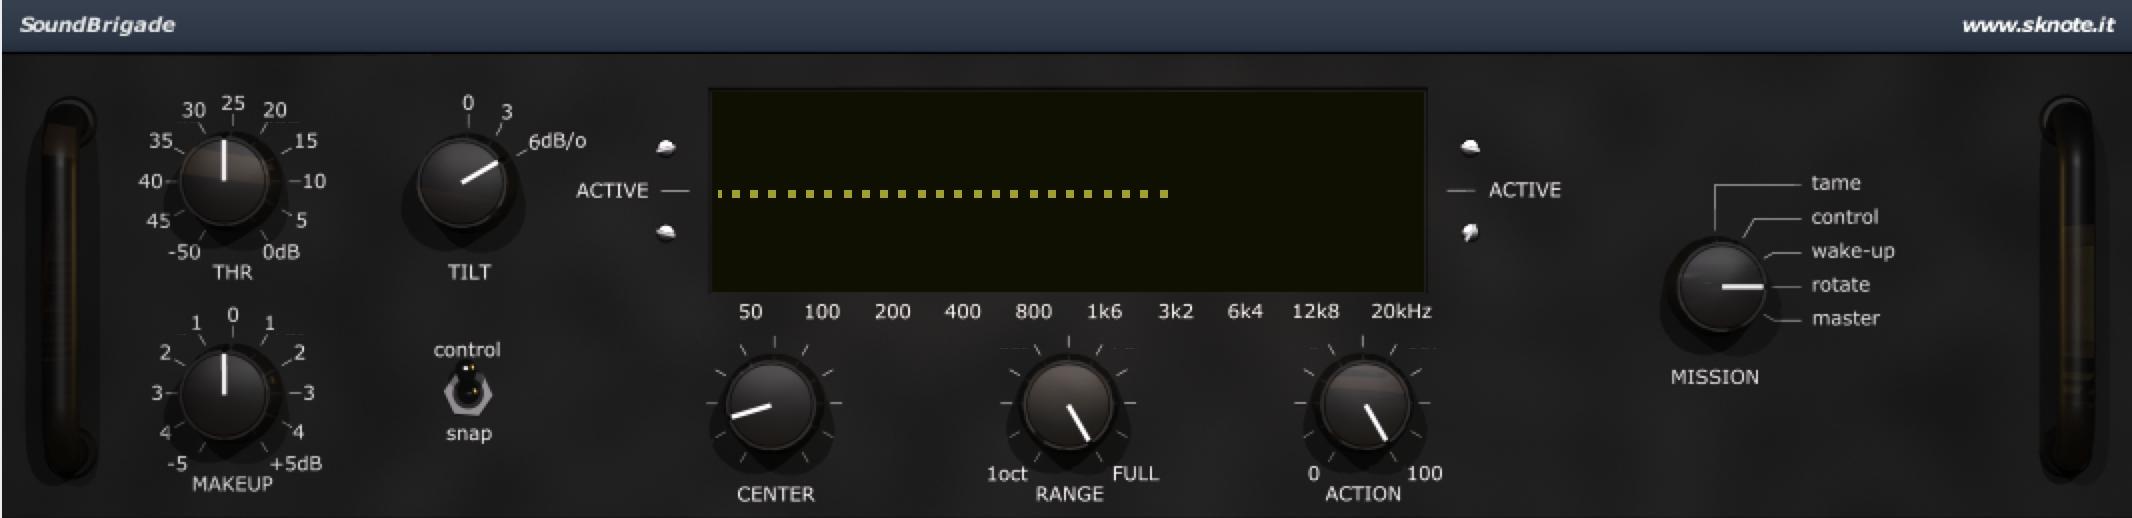 SoundBrigade Electro Beat Interface